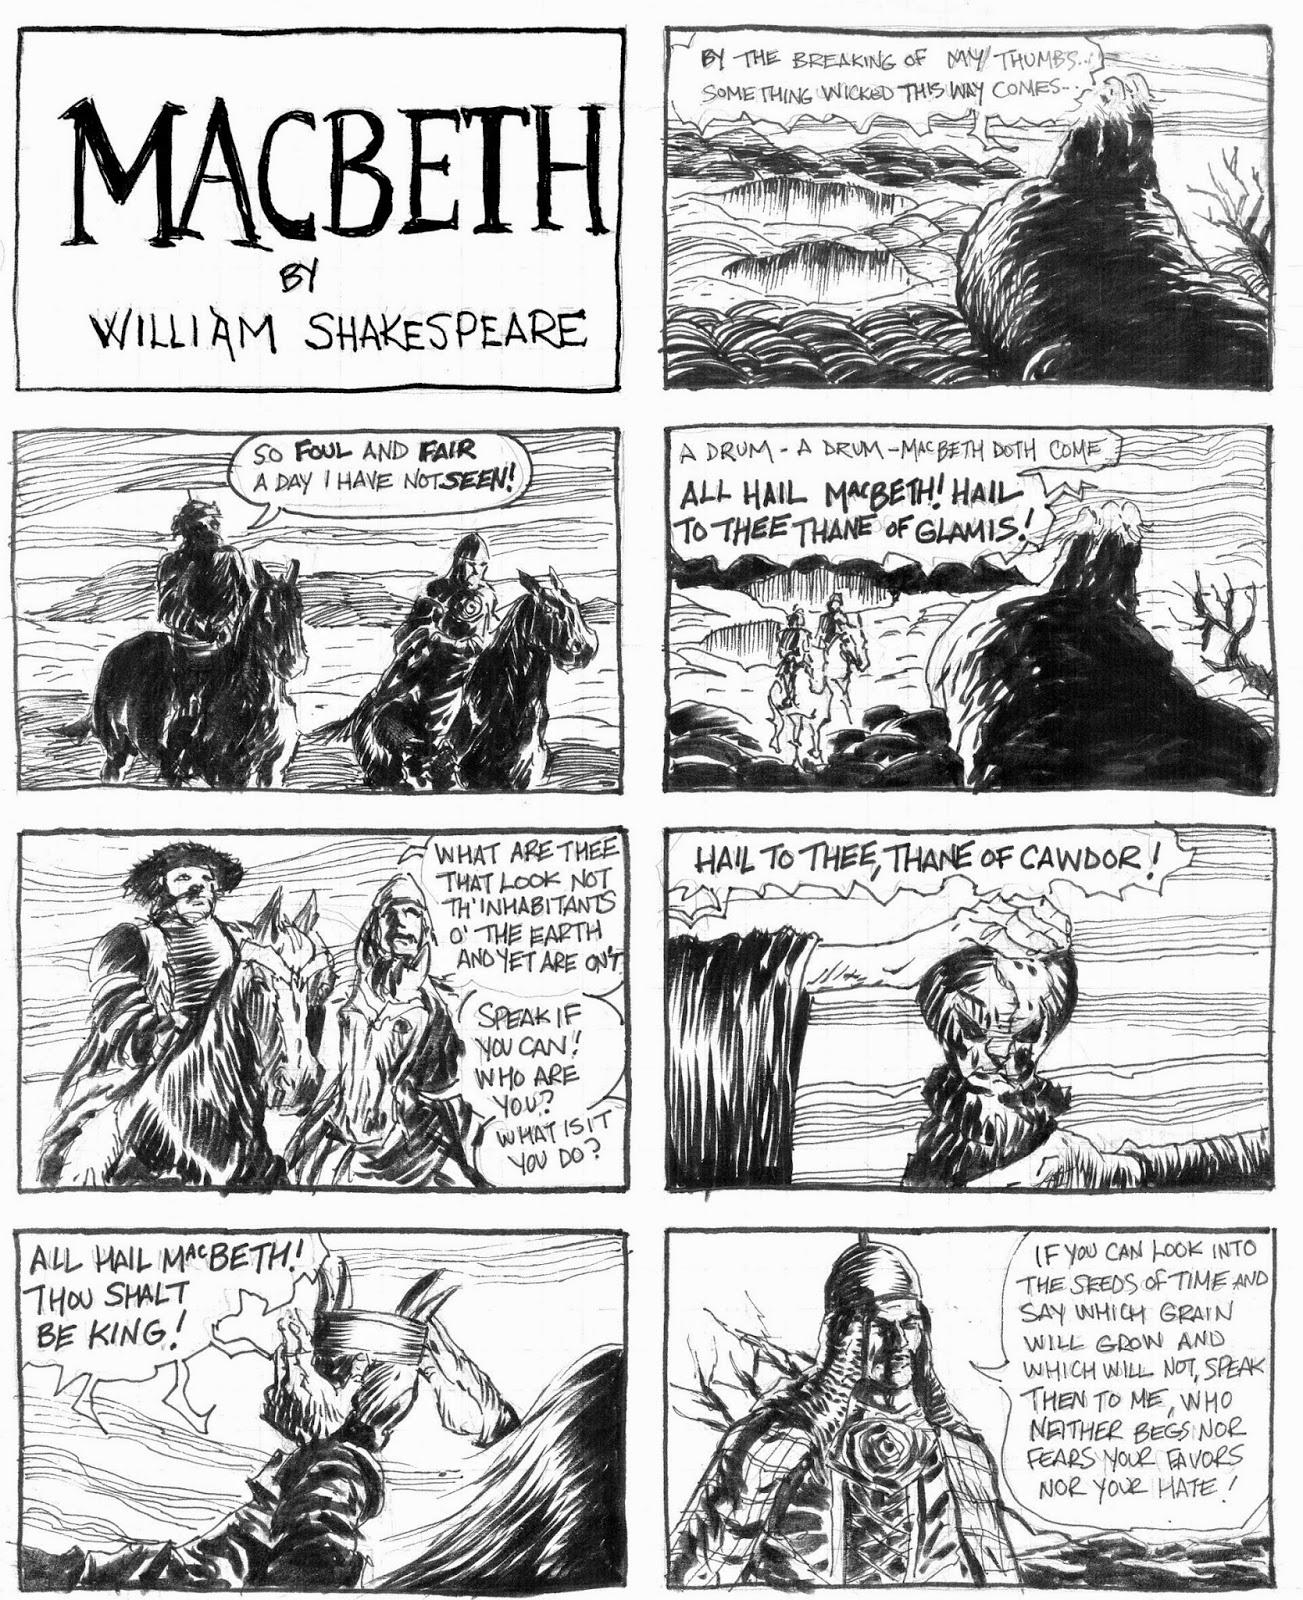 comic macbeth shakespeare strip